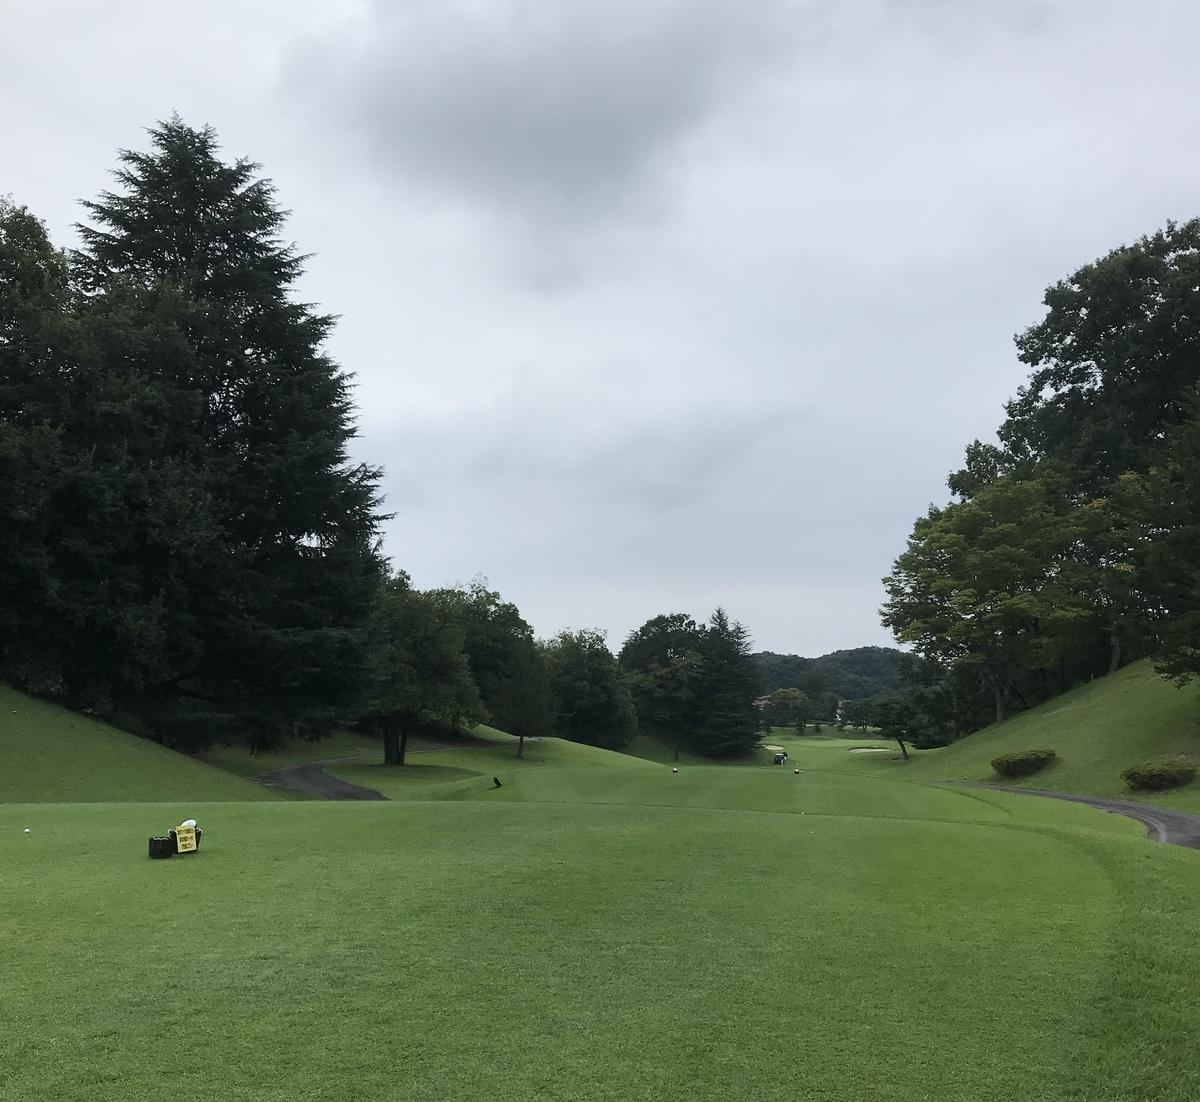 f:id:golfboy:20190918212416j:plain